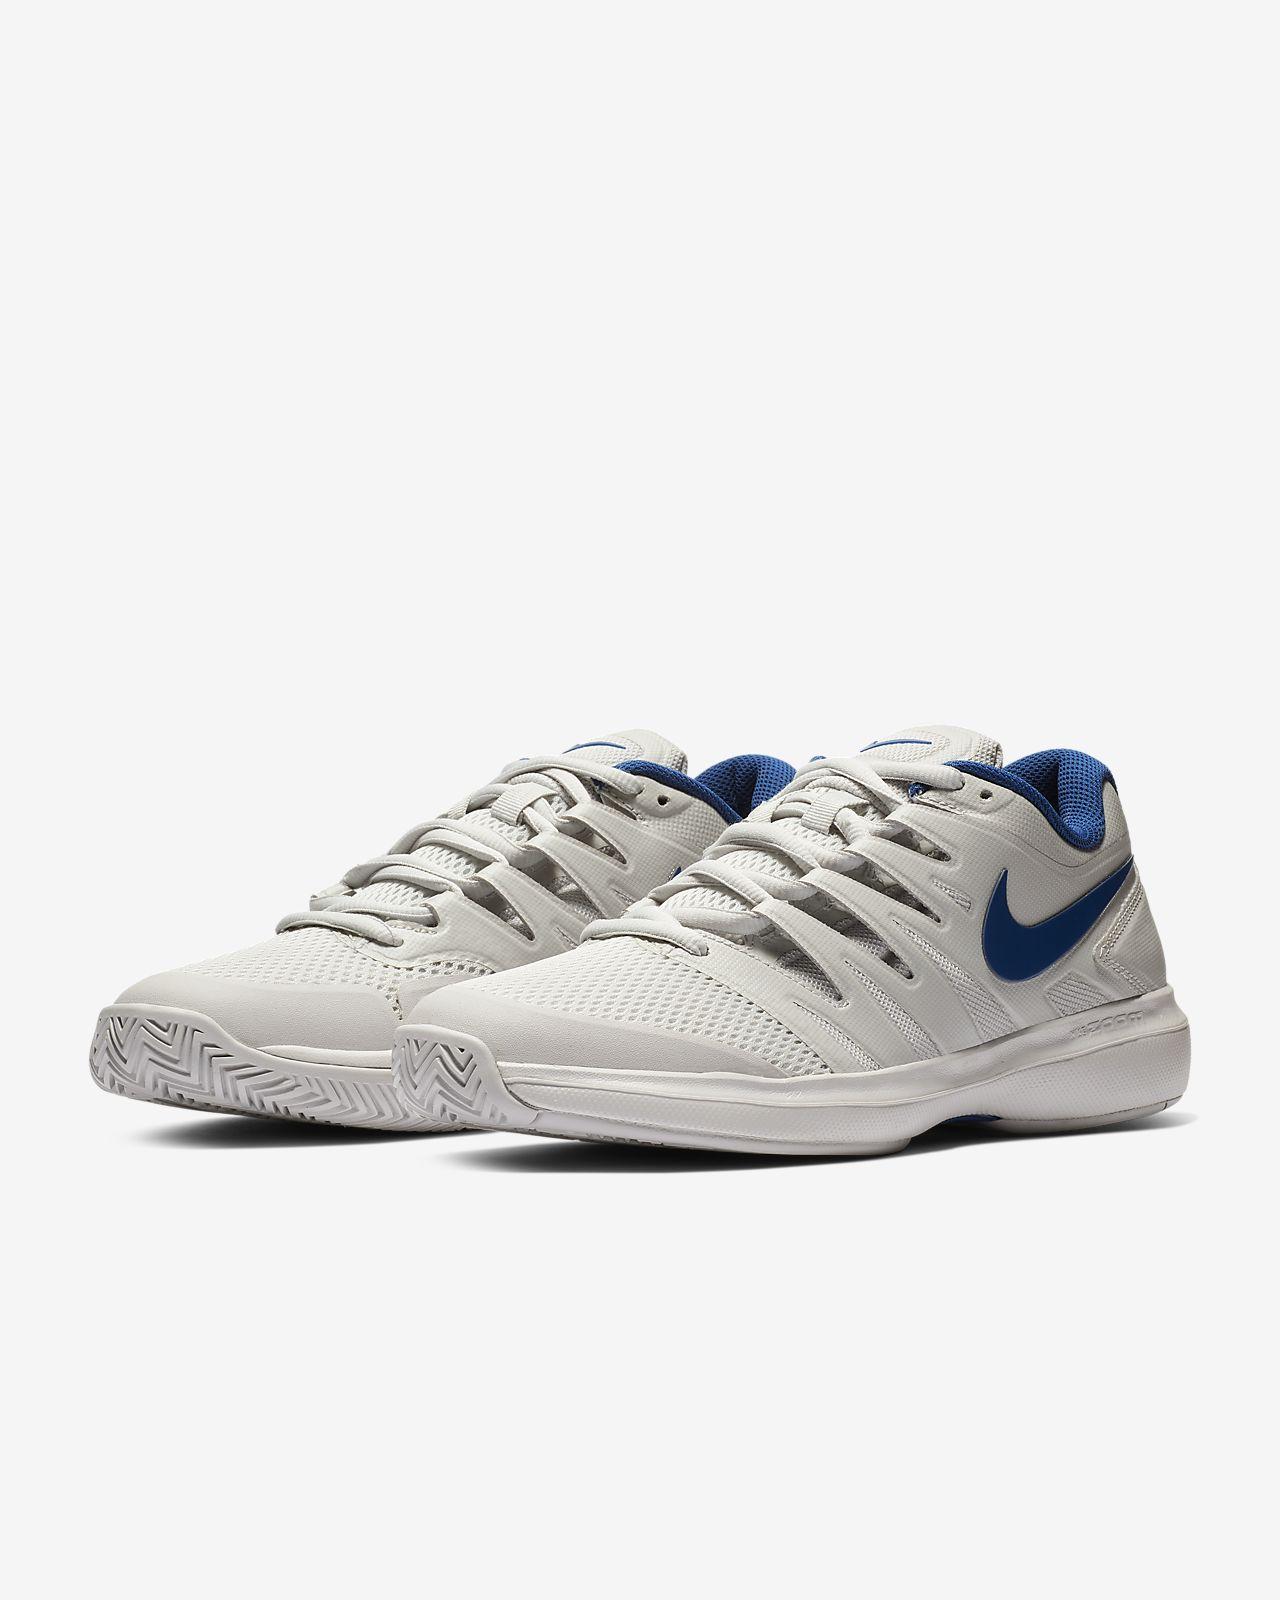 220edc125897 Low Resolution NikeCourt Air Zoom Prestige Men s Hard Court Tennis Shoe  NikeCourt Air Zoom Prestige Men s Hard Court Tennis Shoe